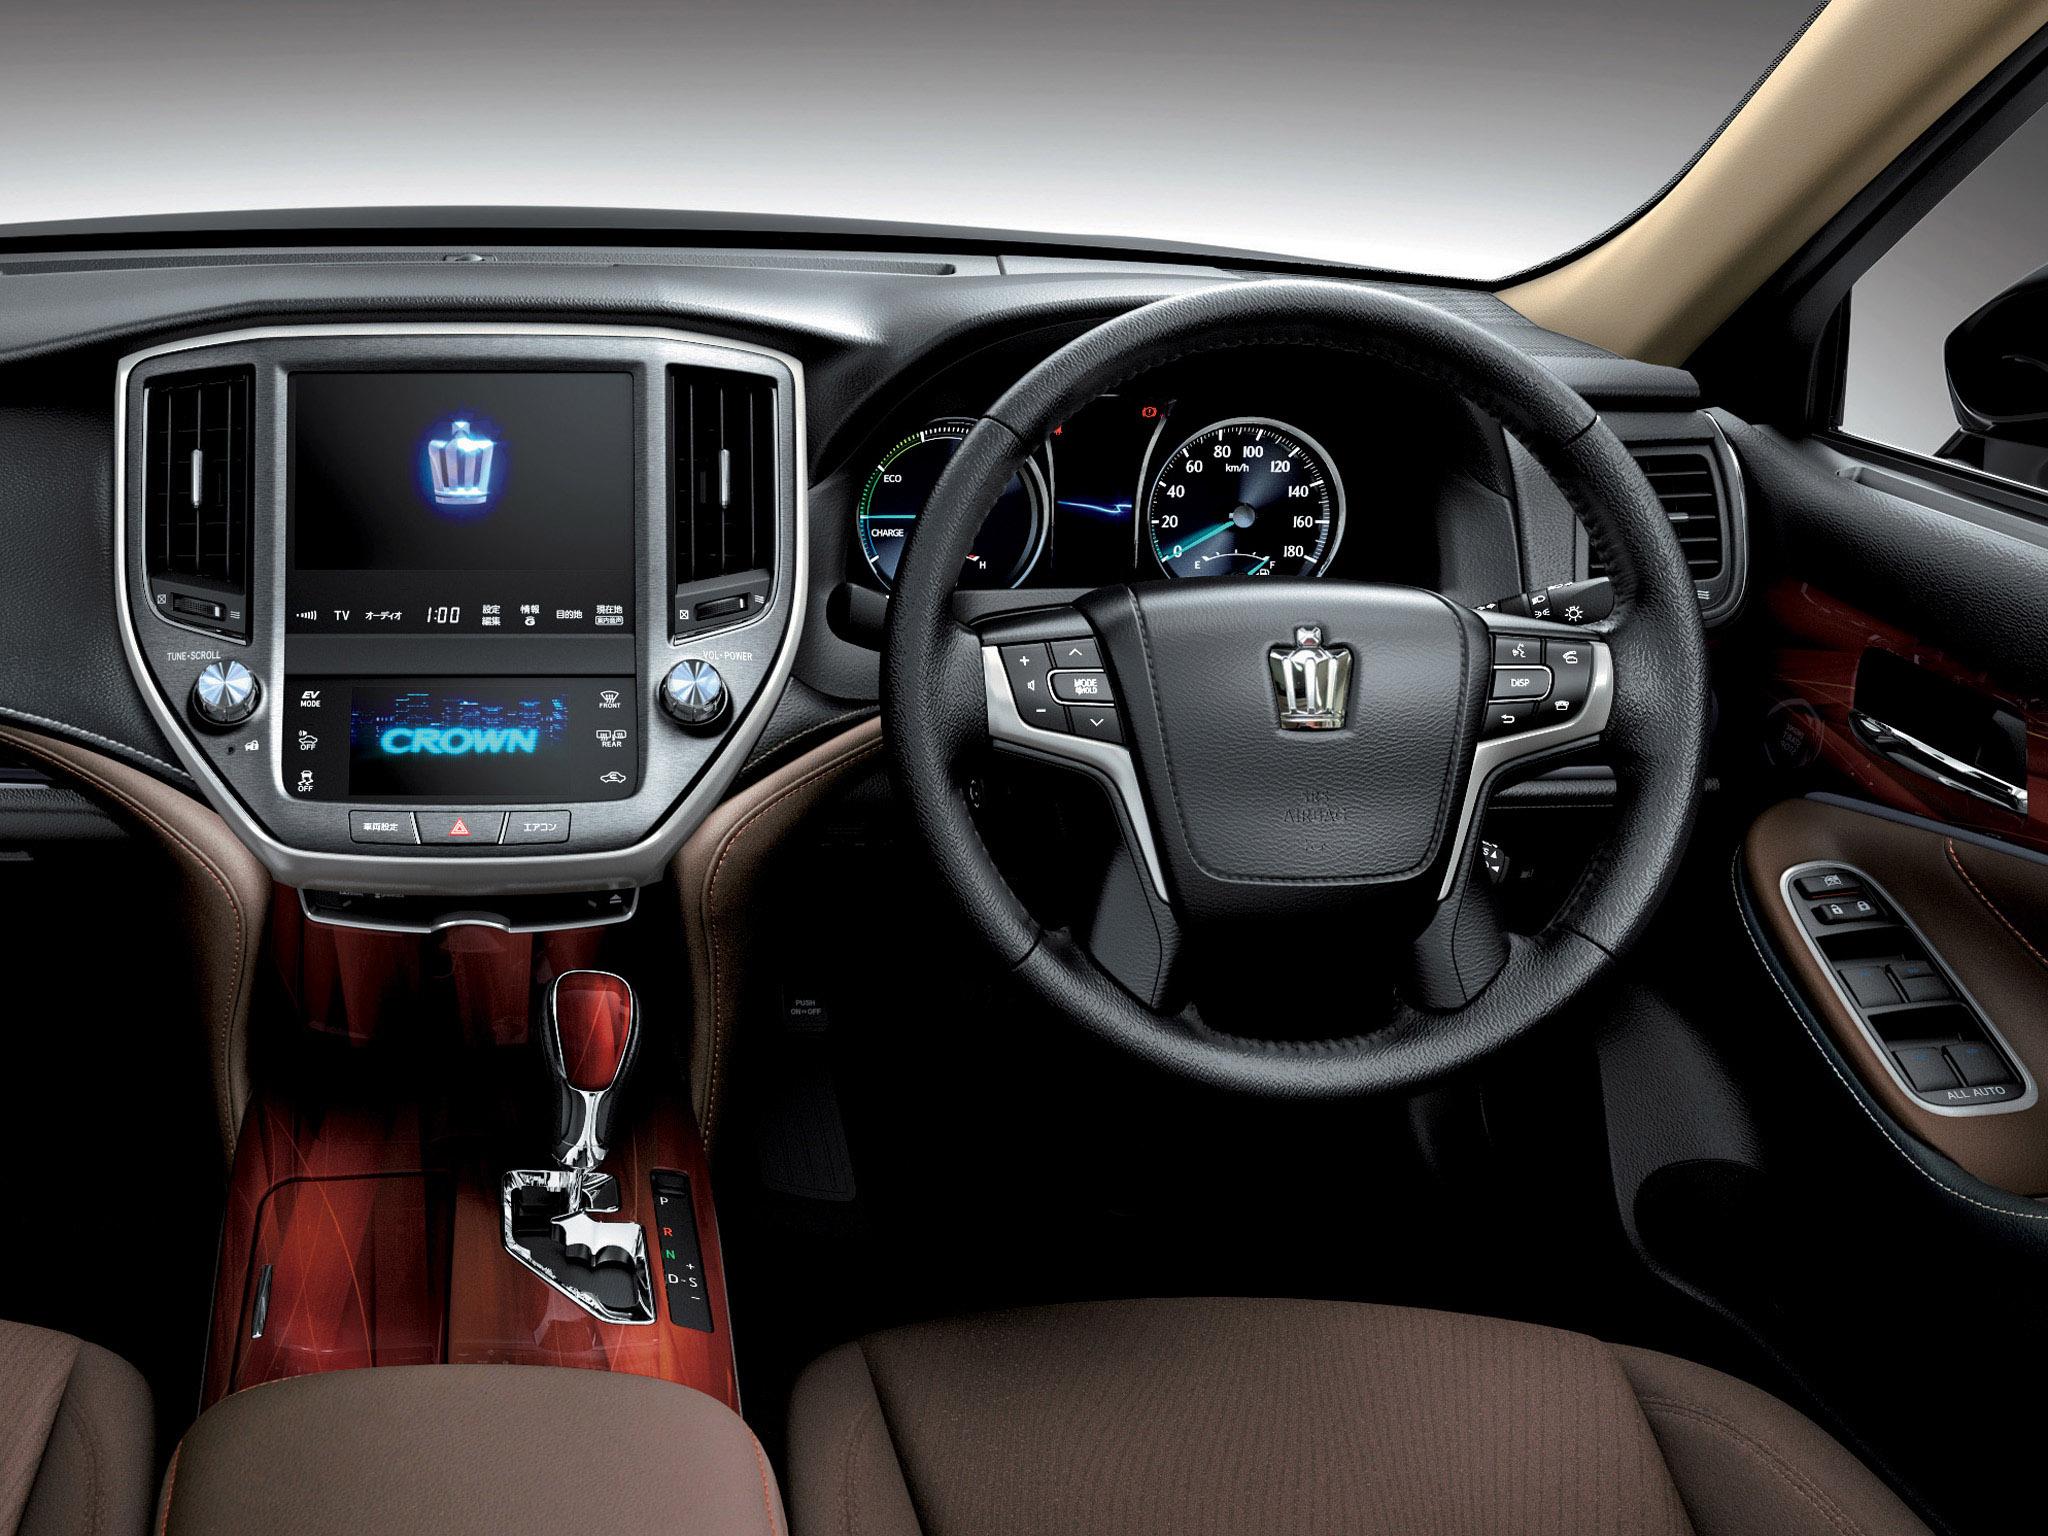 Toyota Кроун 2014 фото #8